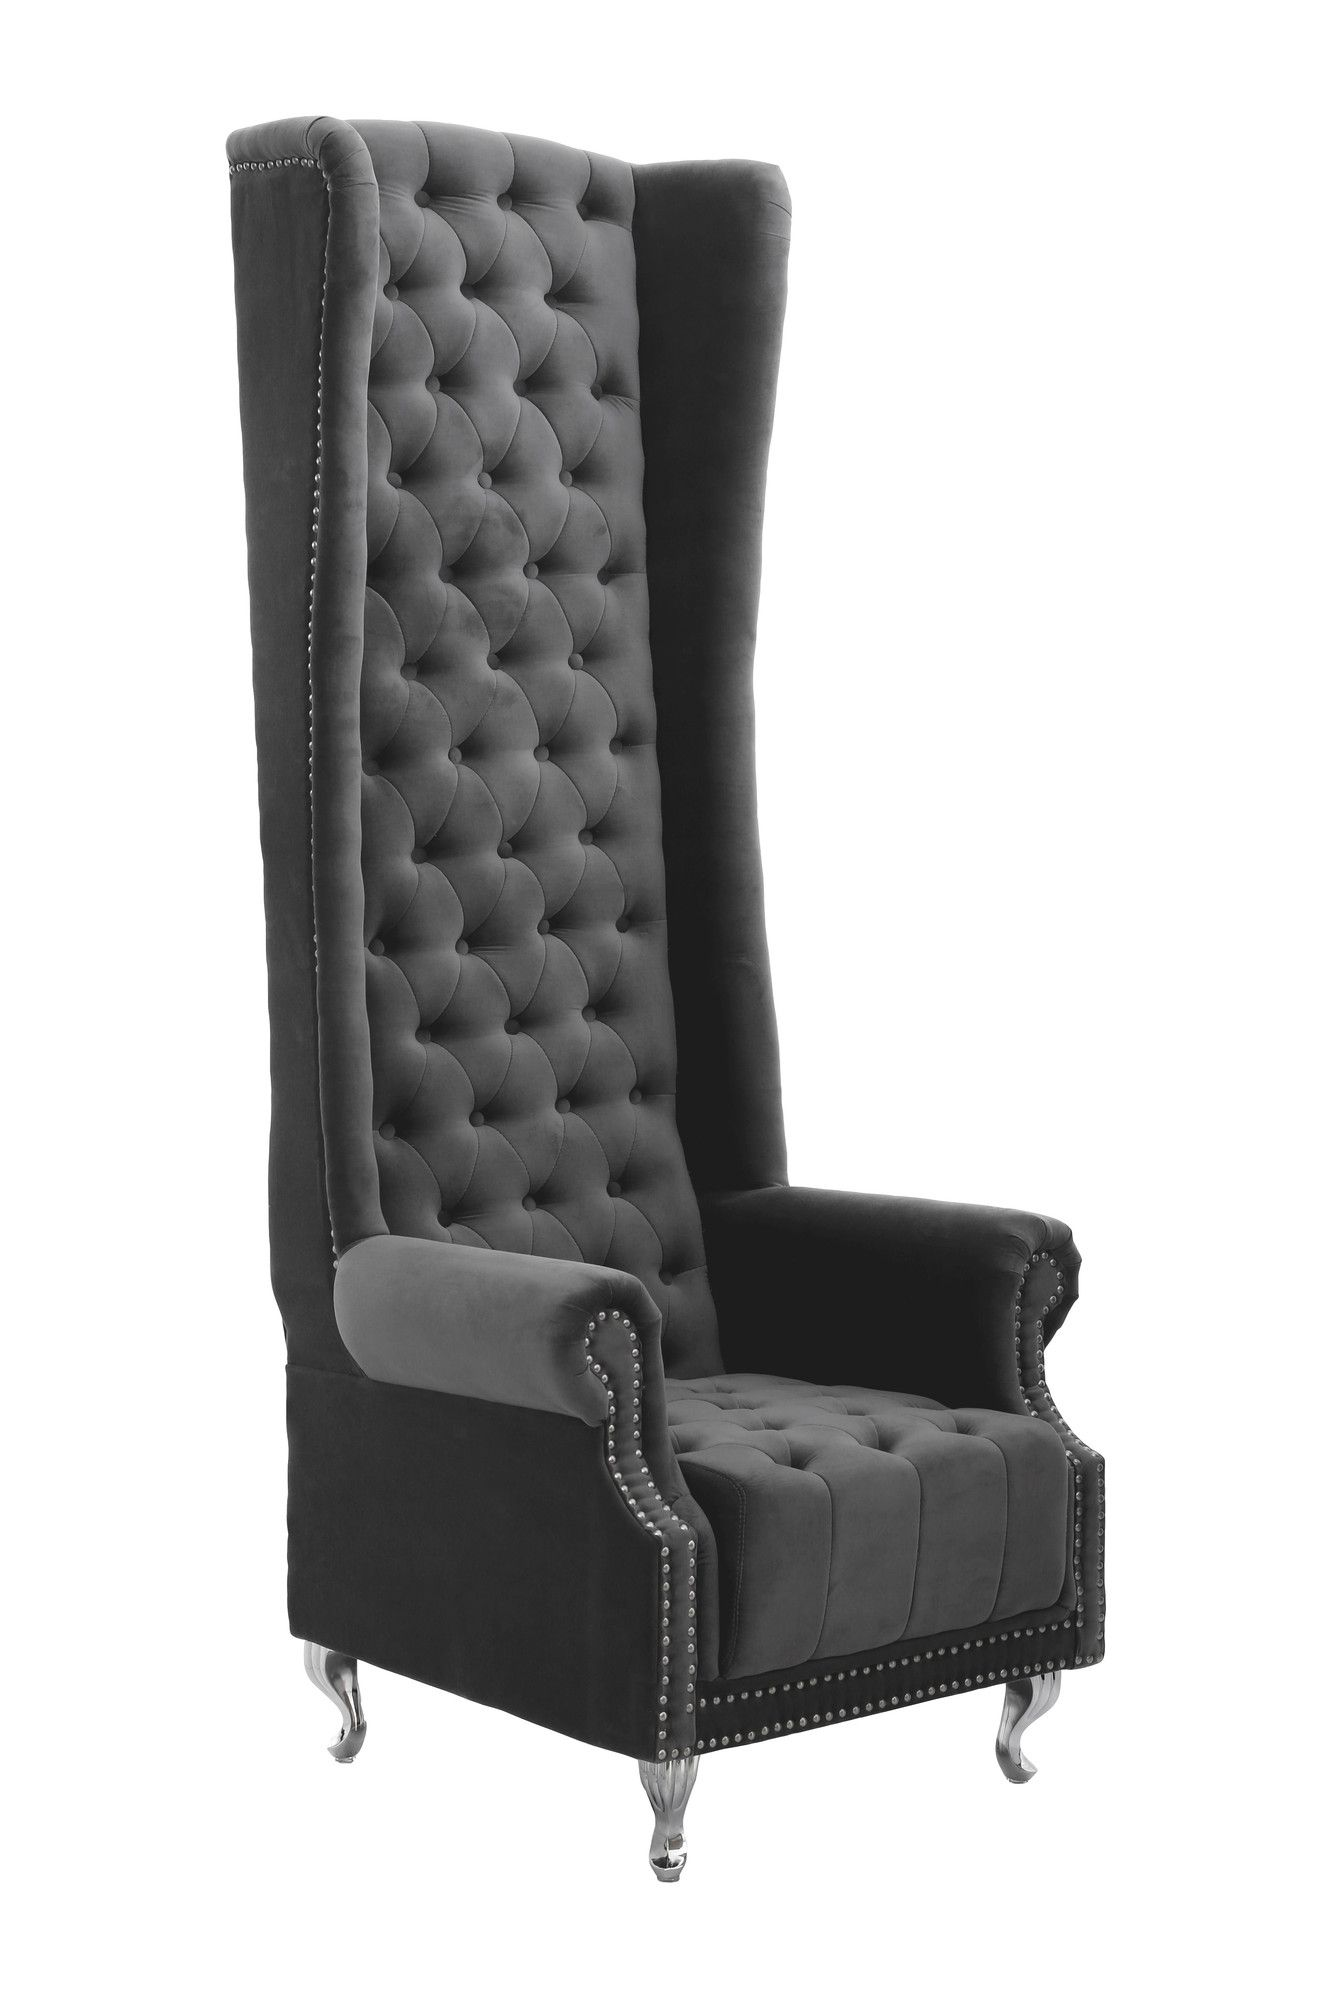 Tall Porter Chair Wayfair Uk Porter Chair Wingback Chair